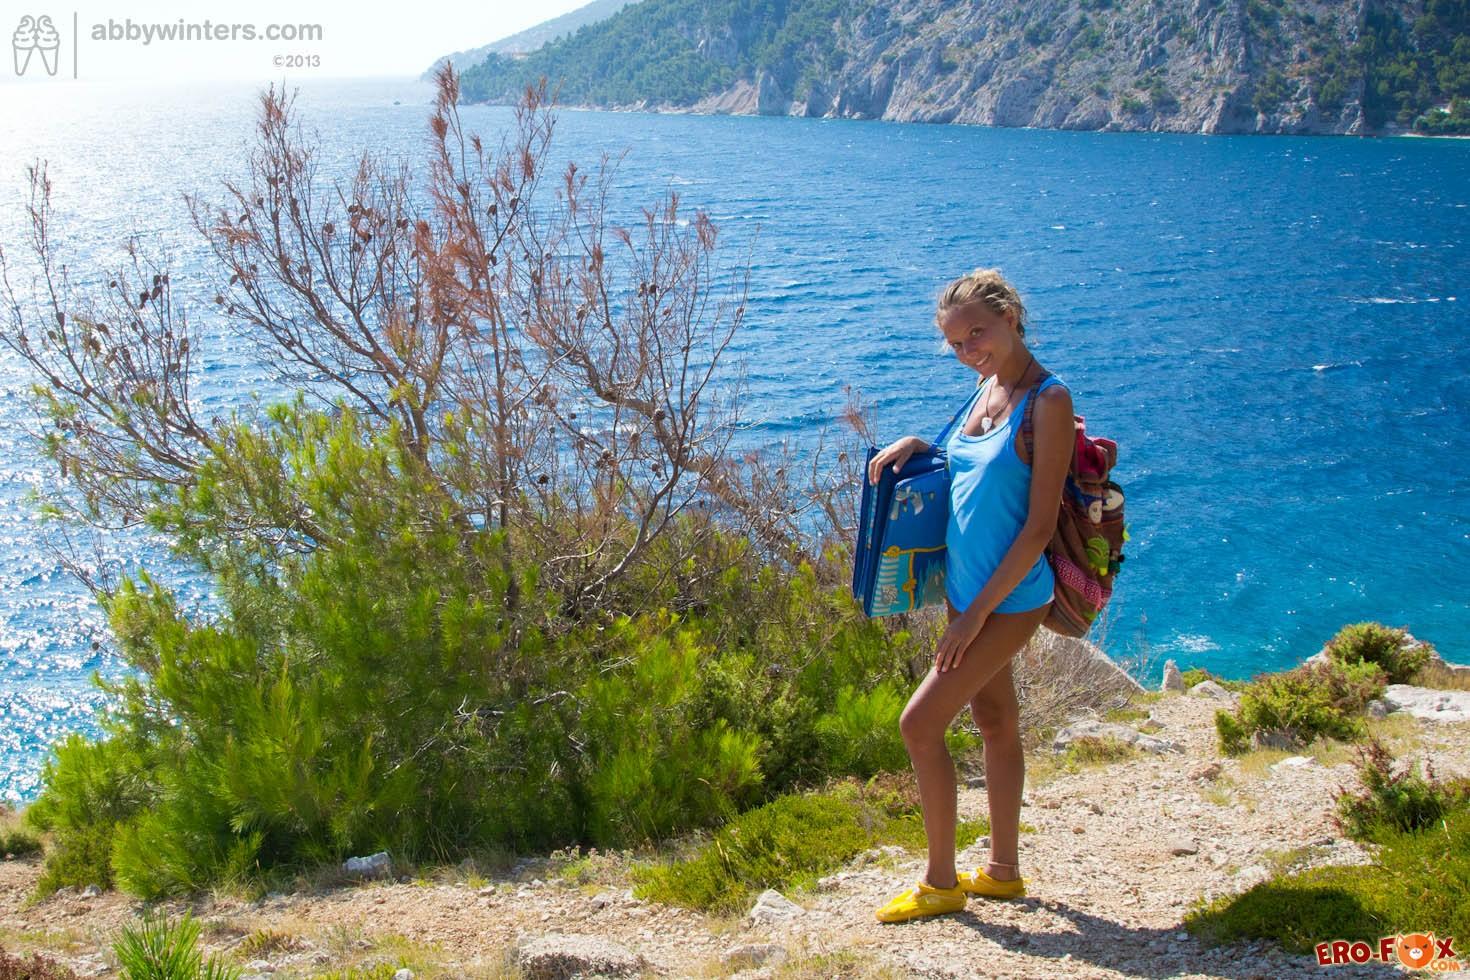 Голая русская девушка загорает на пляже